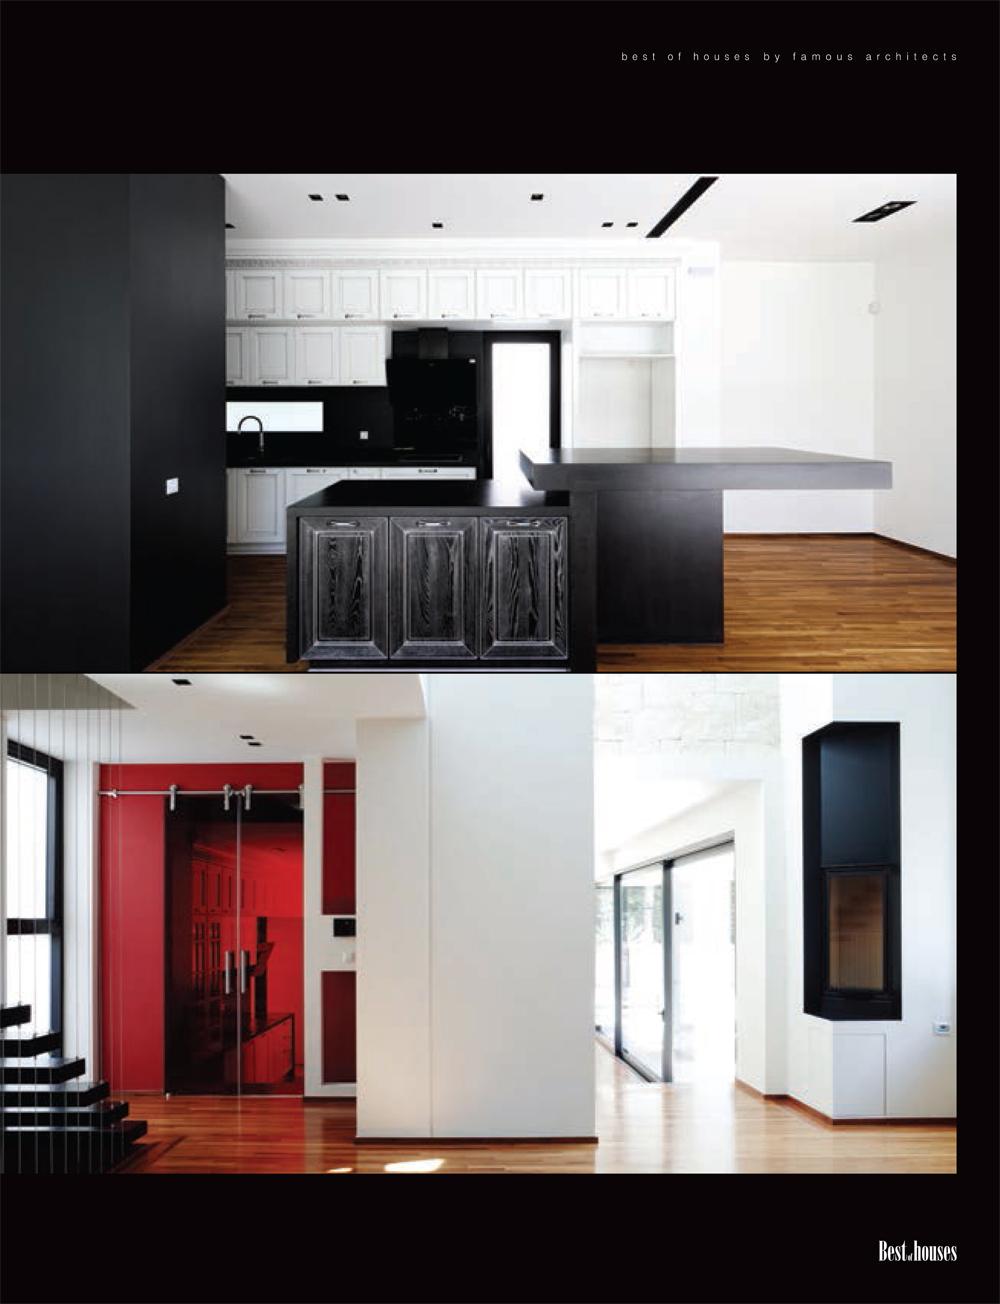 149_161_BoH_Dream_house-9.jpg